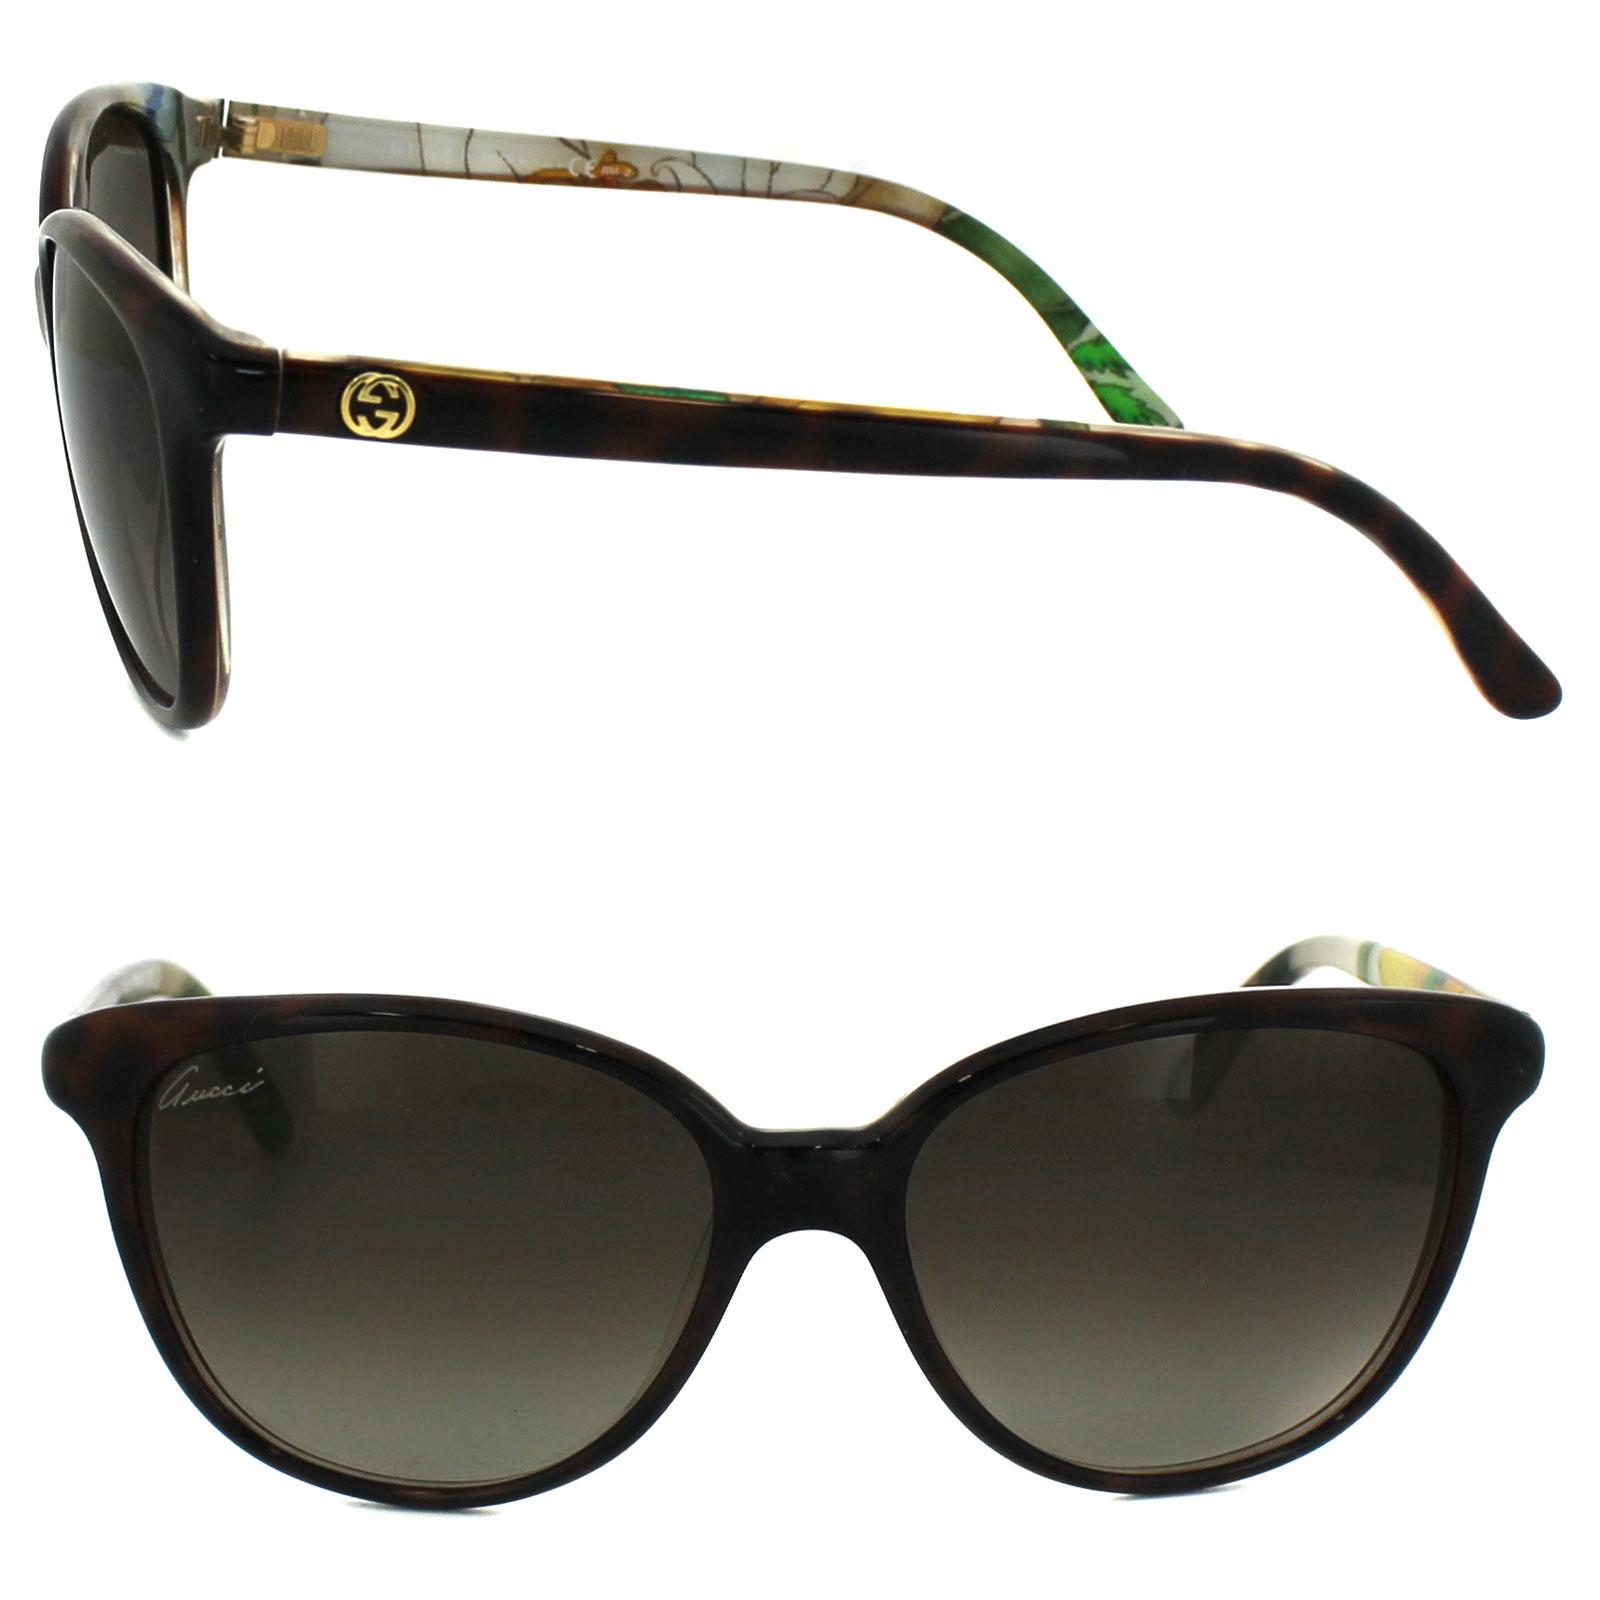 fe15da288e Sentinel Gucci Sunglasses 3633 N S Z99 HA Dark Havana Flower Brown Gradient